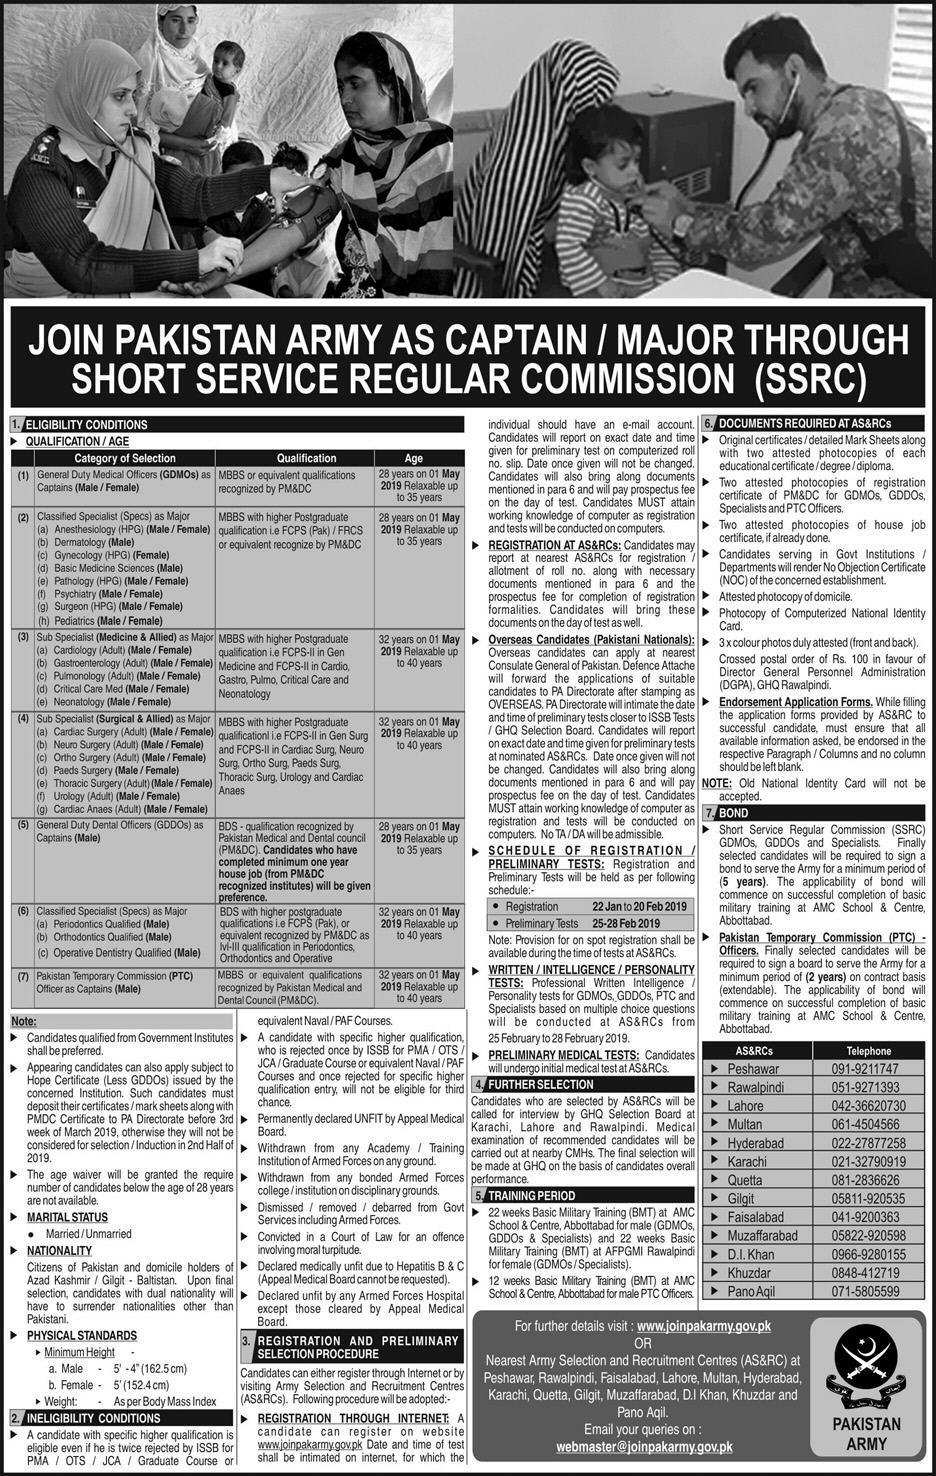 Pakistan Army Captain, Major Jobs 2019 Through SSRC Registration Form Online